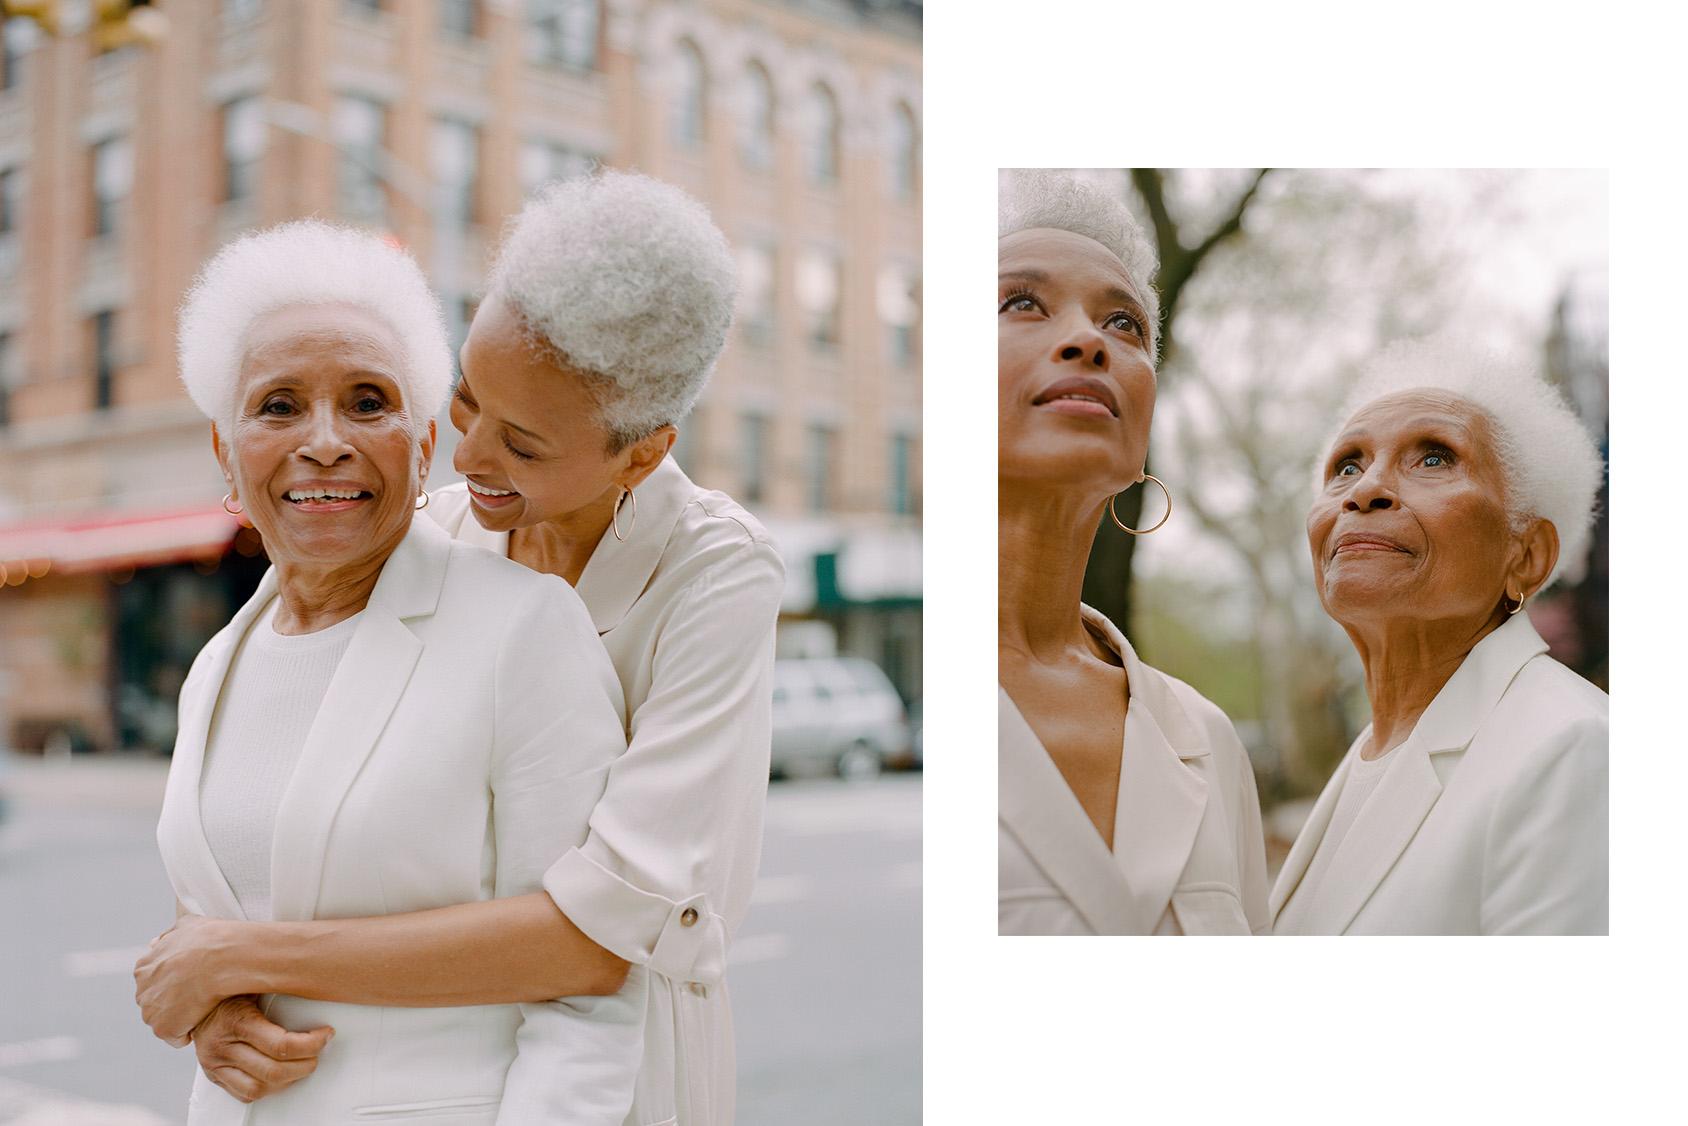 When I'm With Her: Karen & Doreen